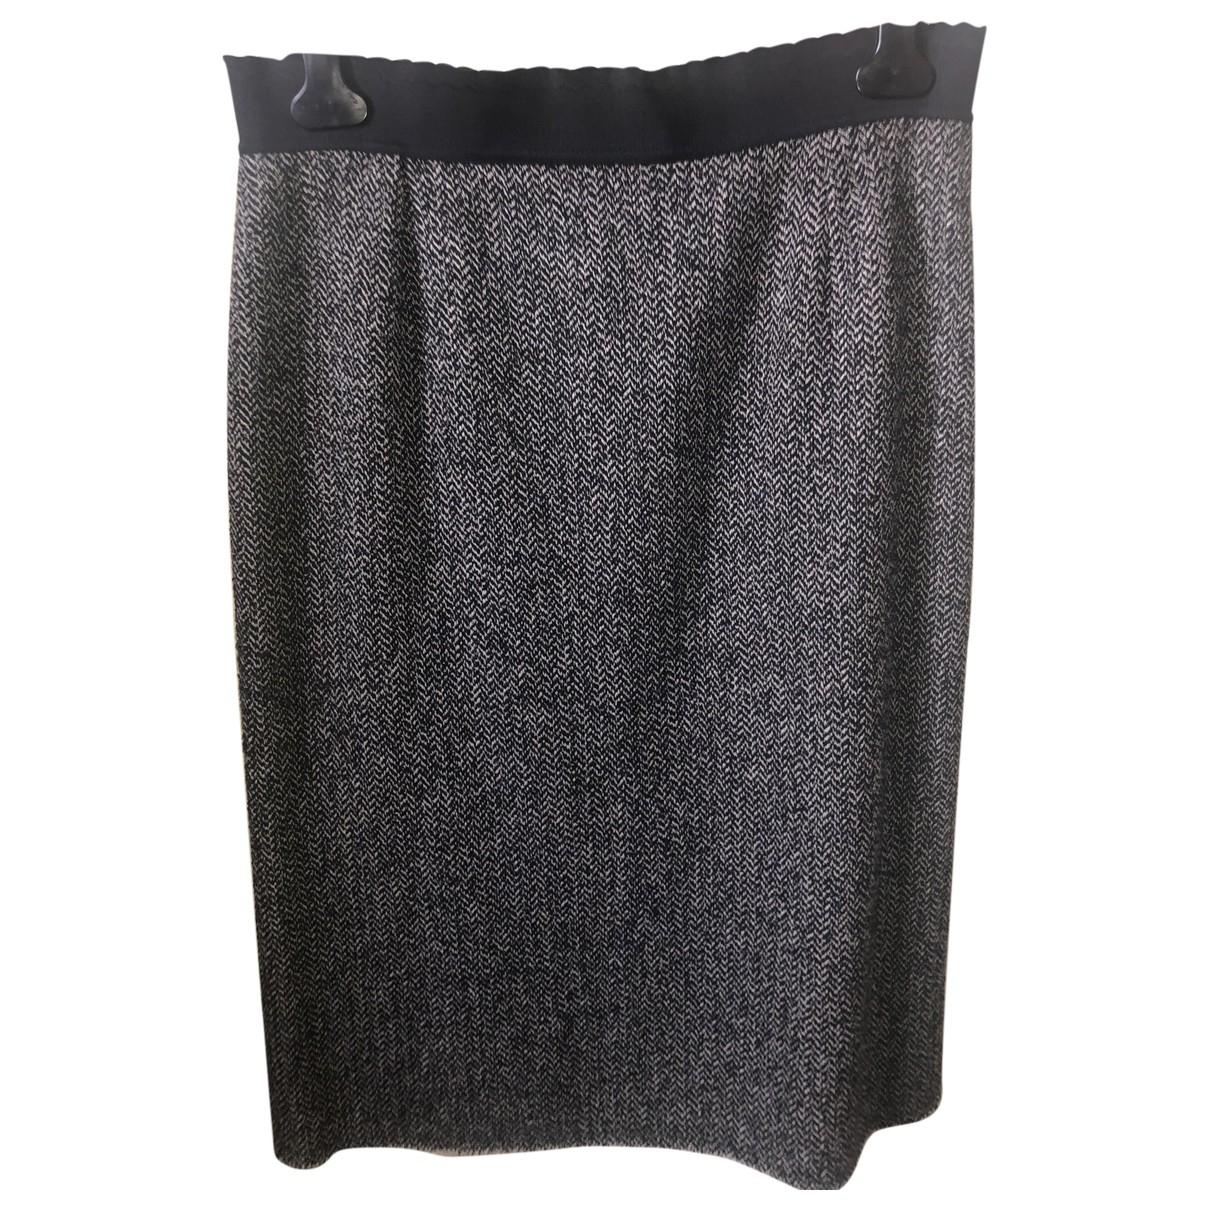 Dolce & Gabbana \N Wool skirt for Women 46 IT